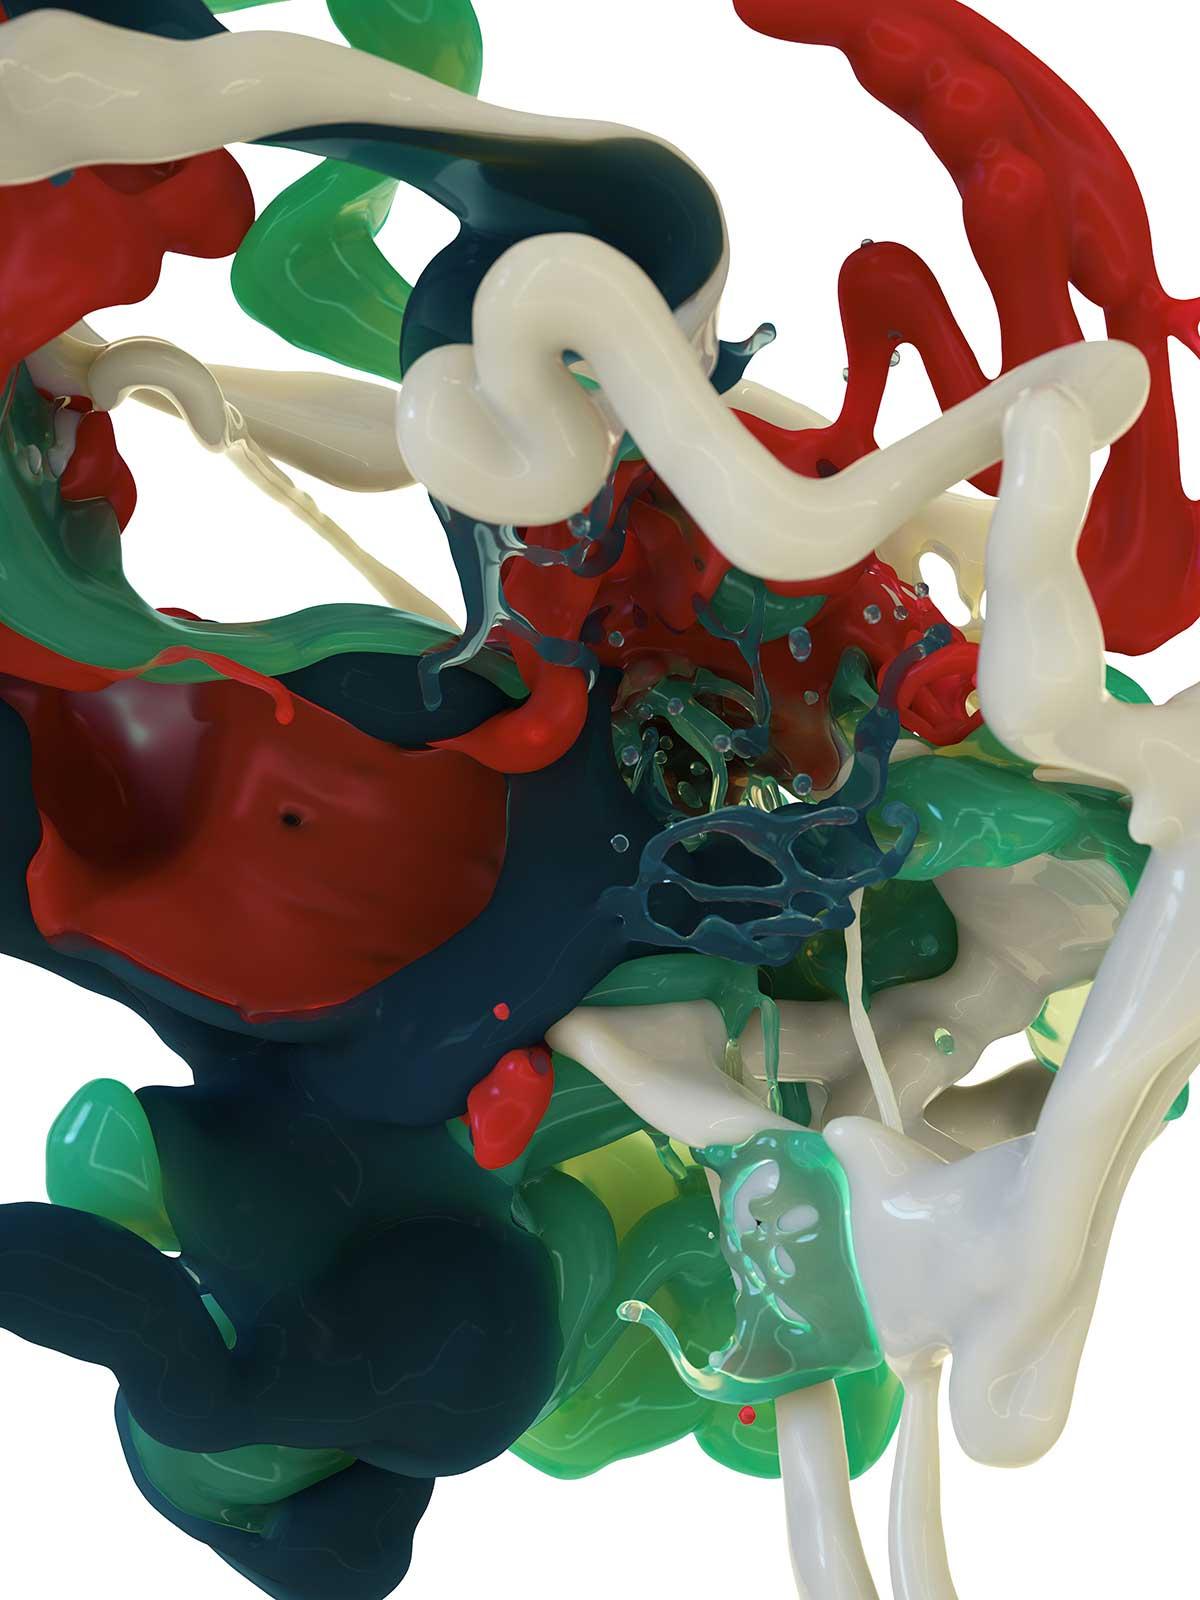 Bodypaint III 06, CGI Fine Art Print, 140 x 105 cm, 2016